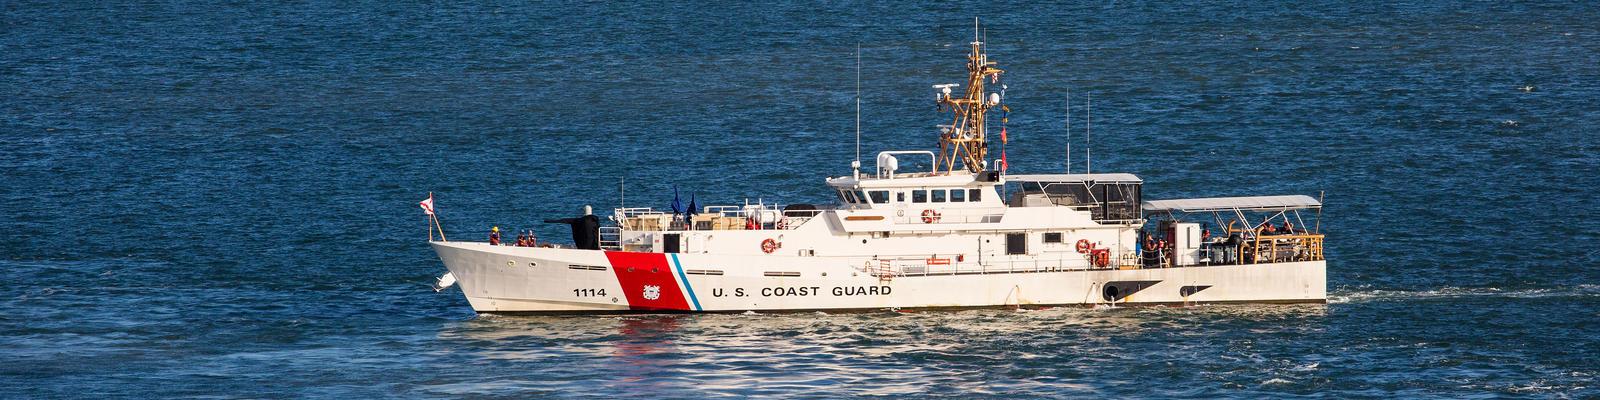 Coast Guard Navigating Near a Port of San Juan (Photo: Carlos Yudica/Shutterstock)